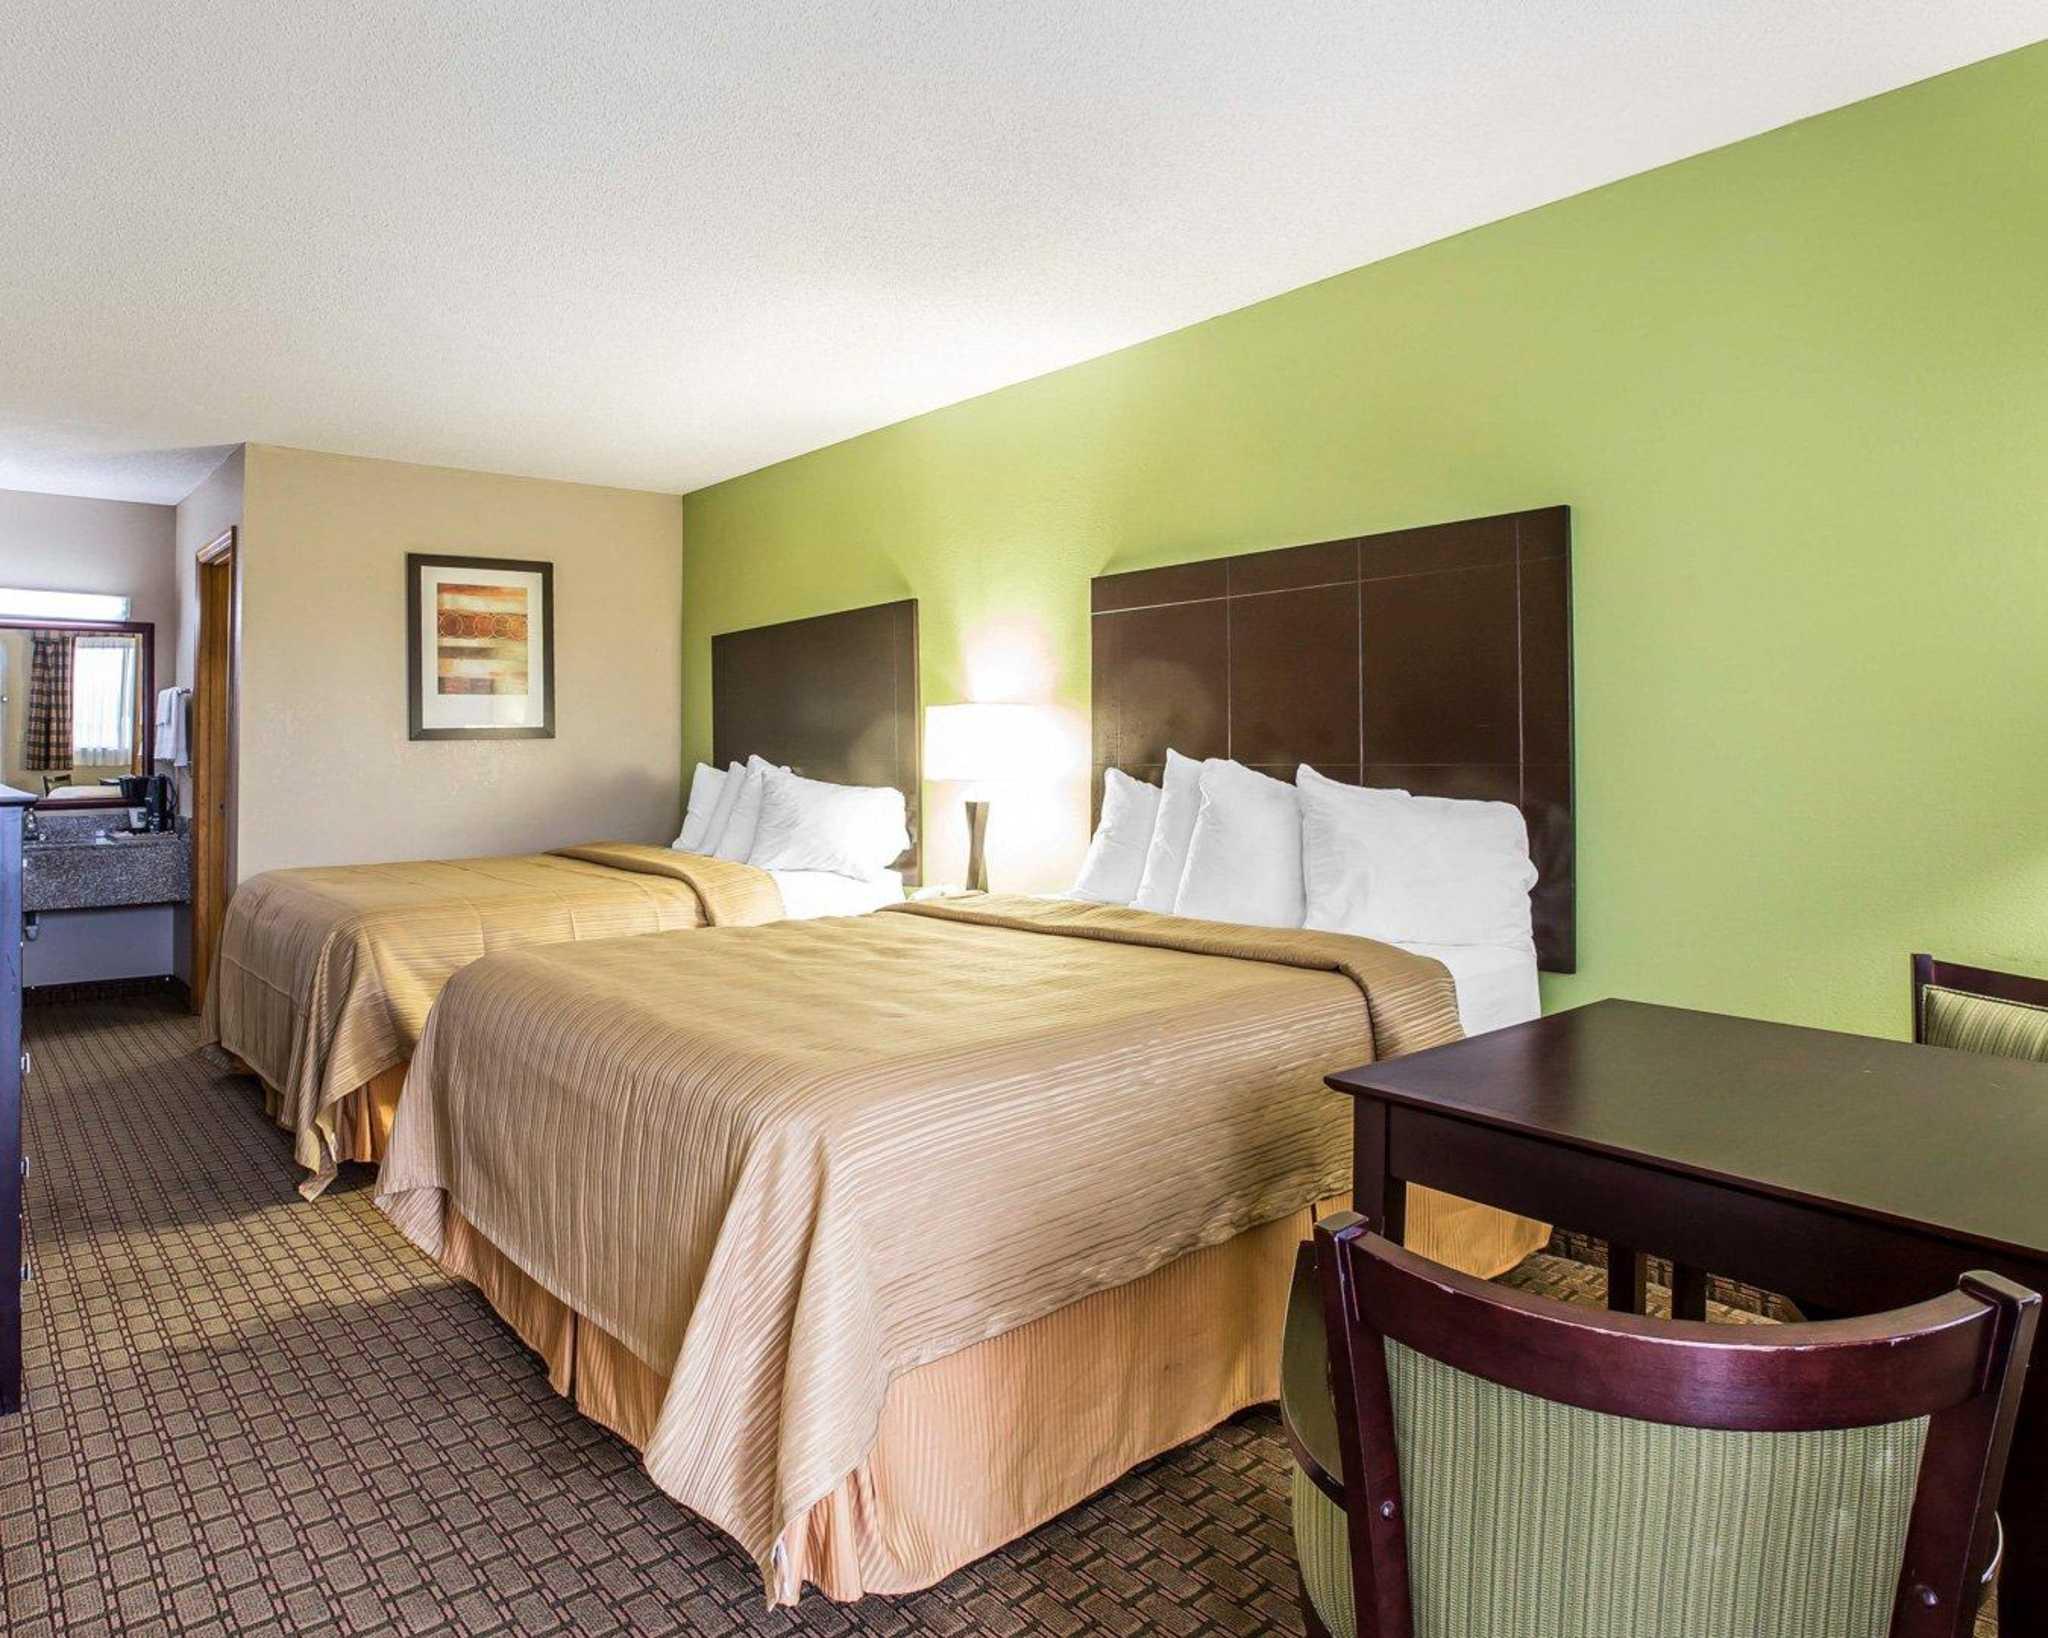 Quality Inn & Suites Dublin image 3